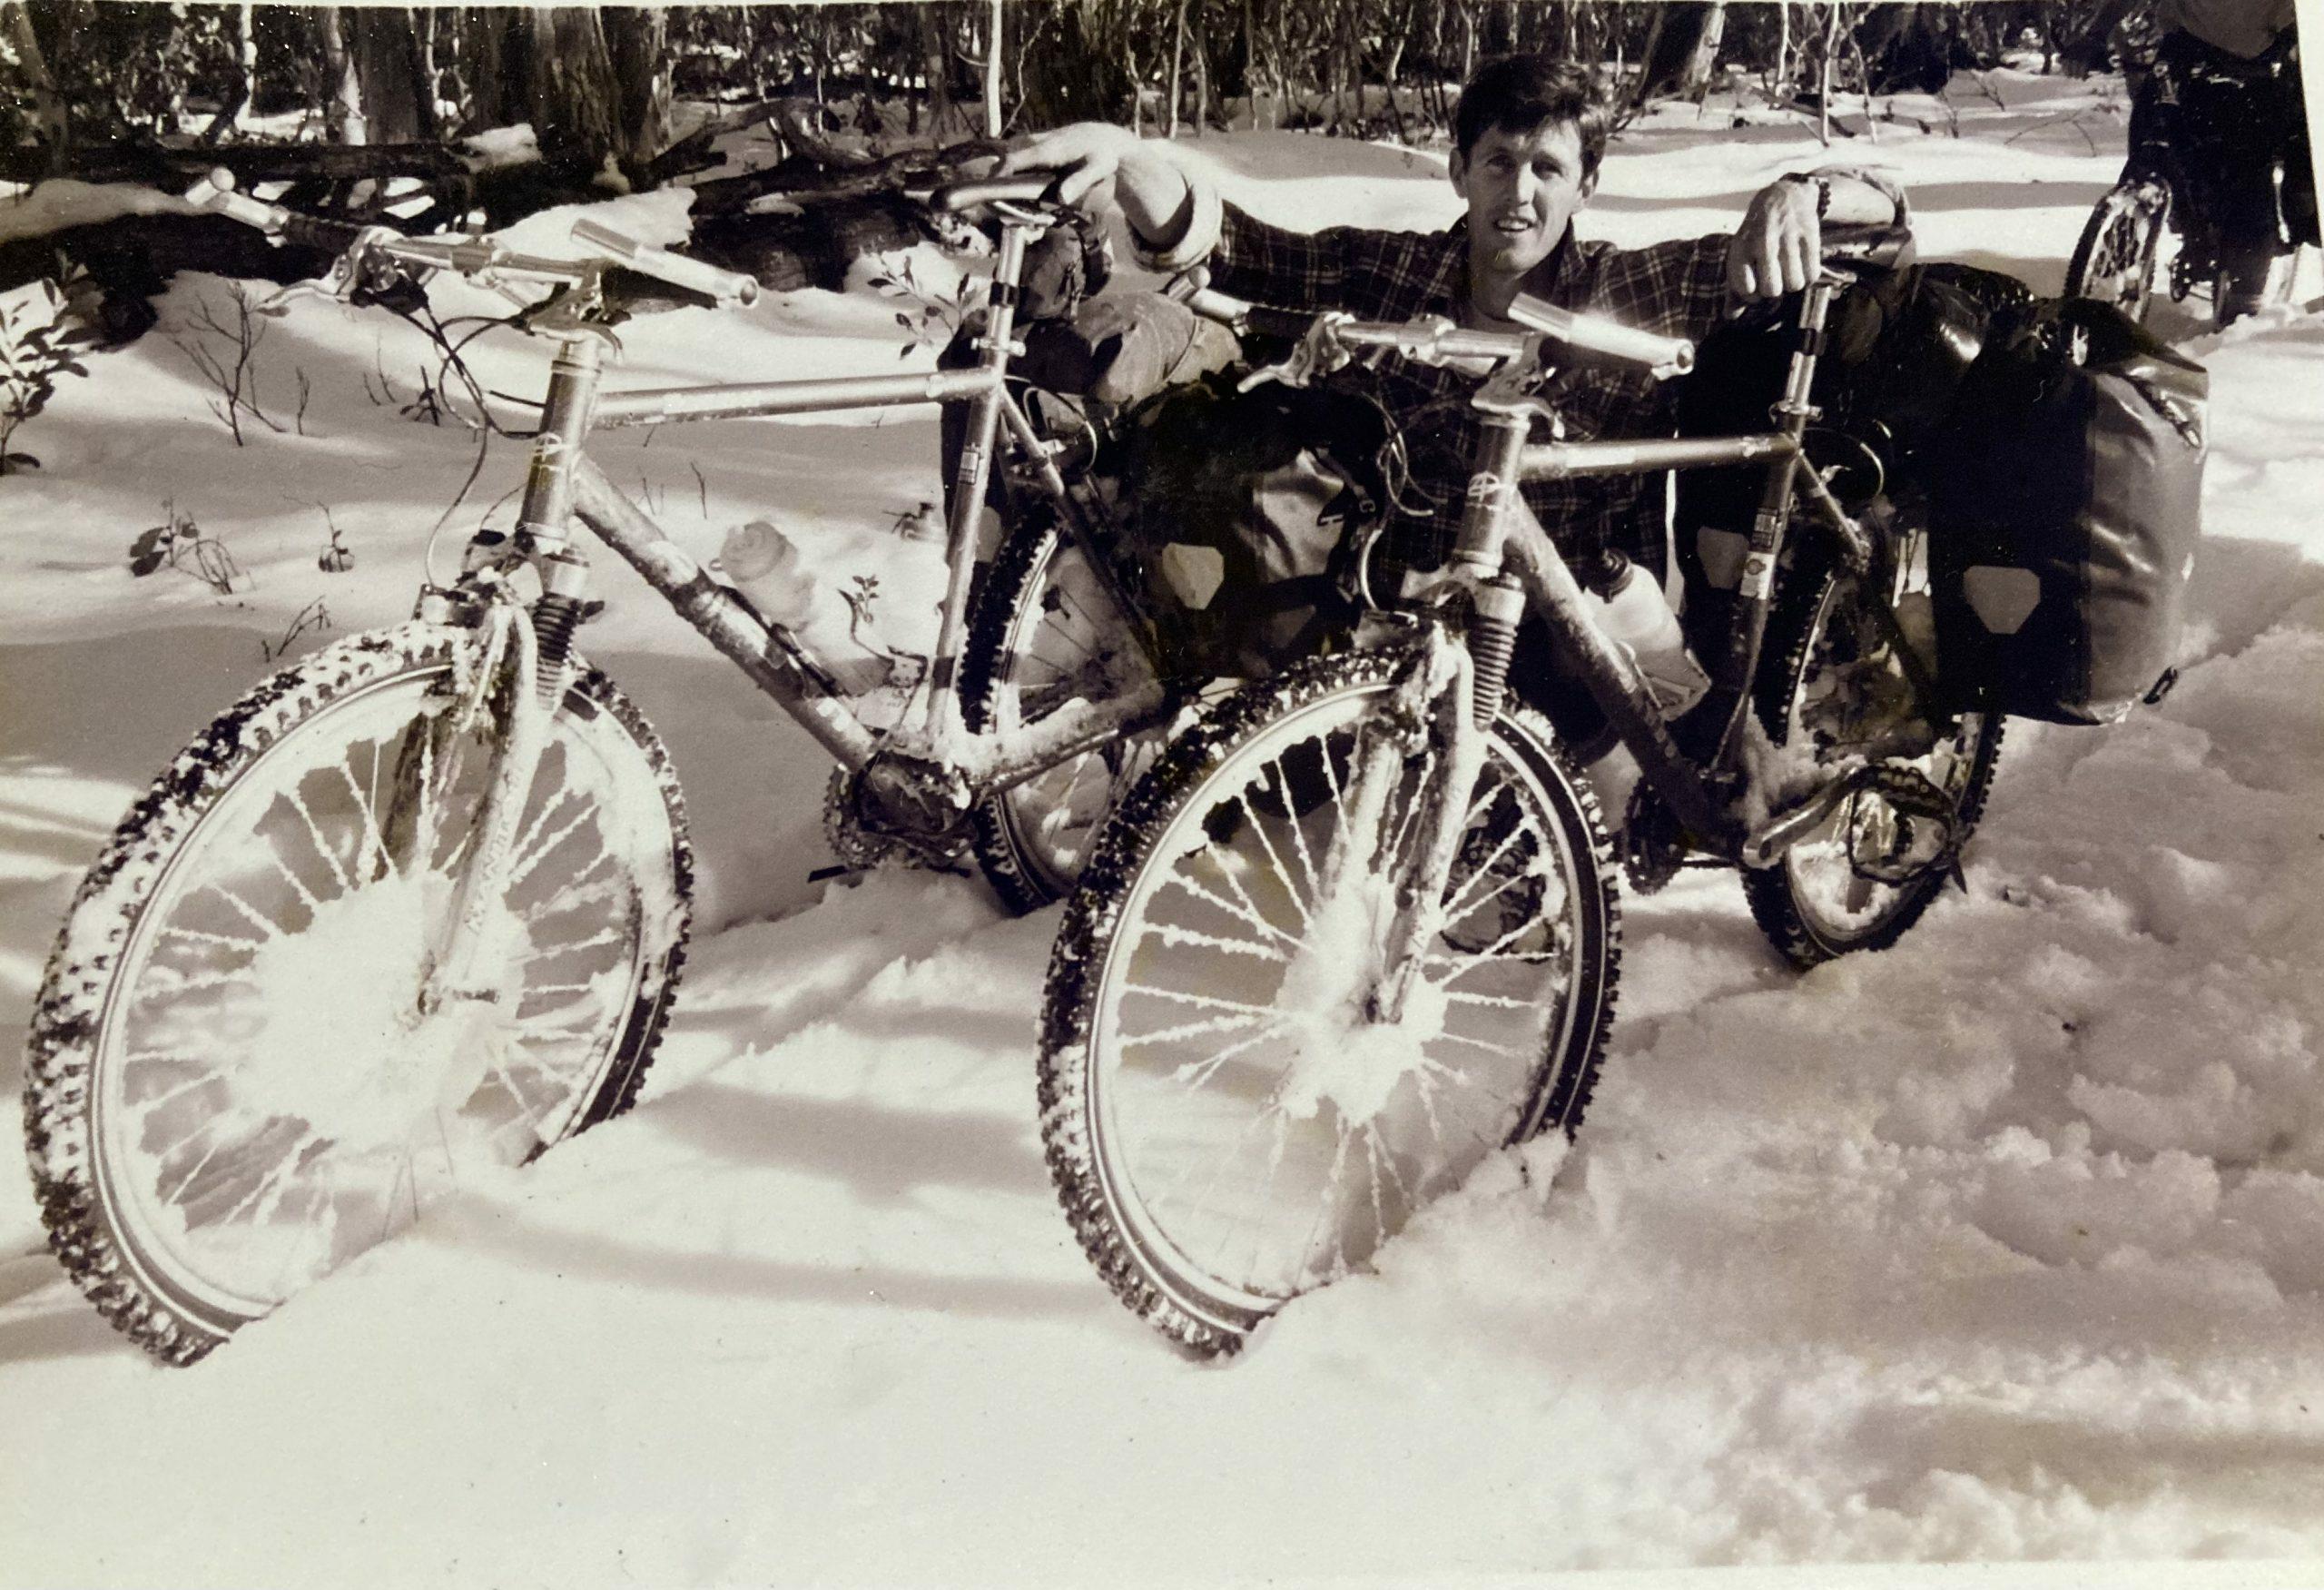 Hike a bike memories from Paul O'Brien